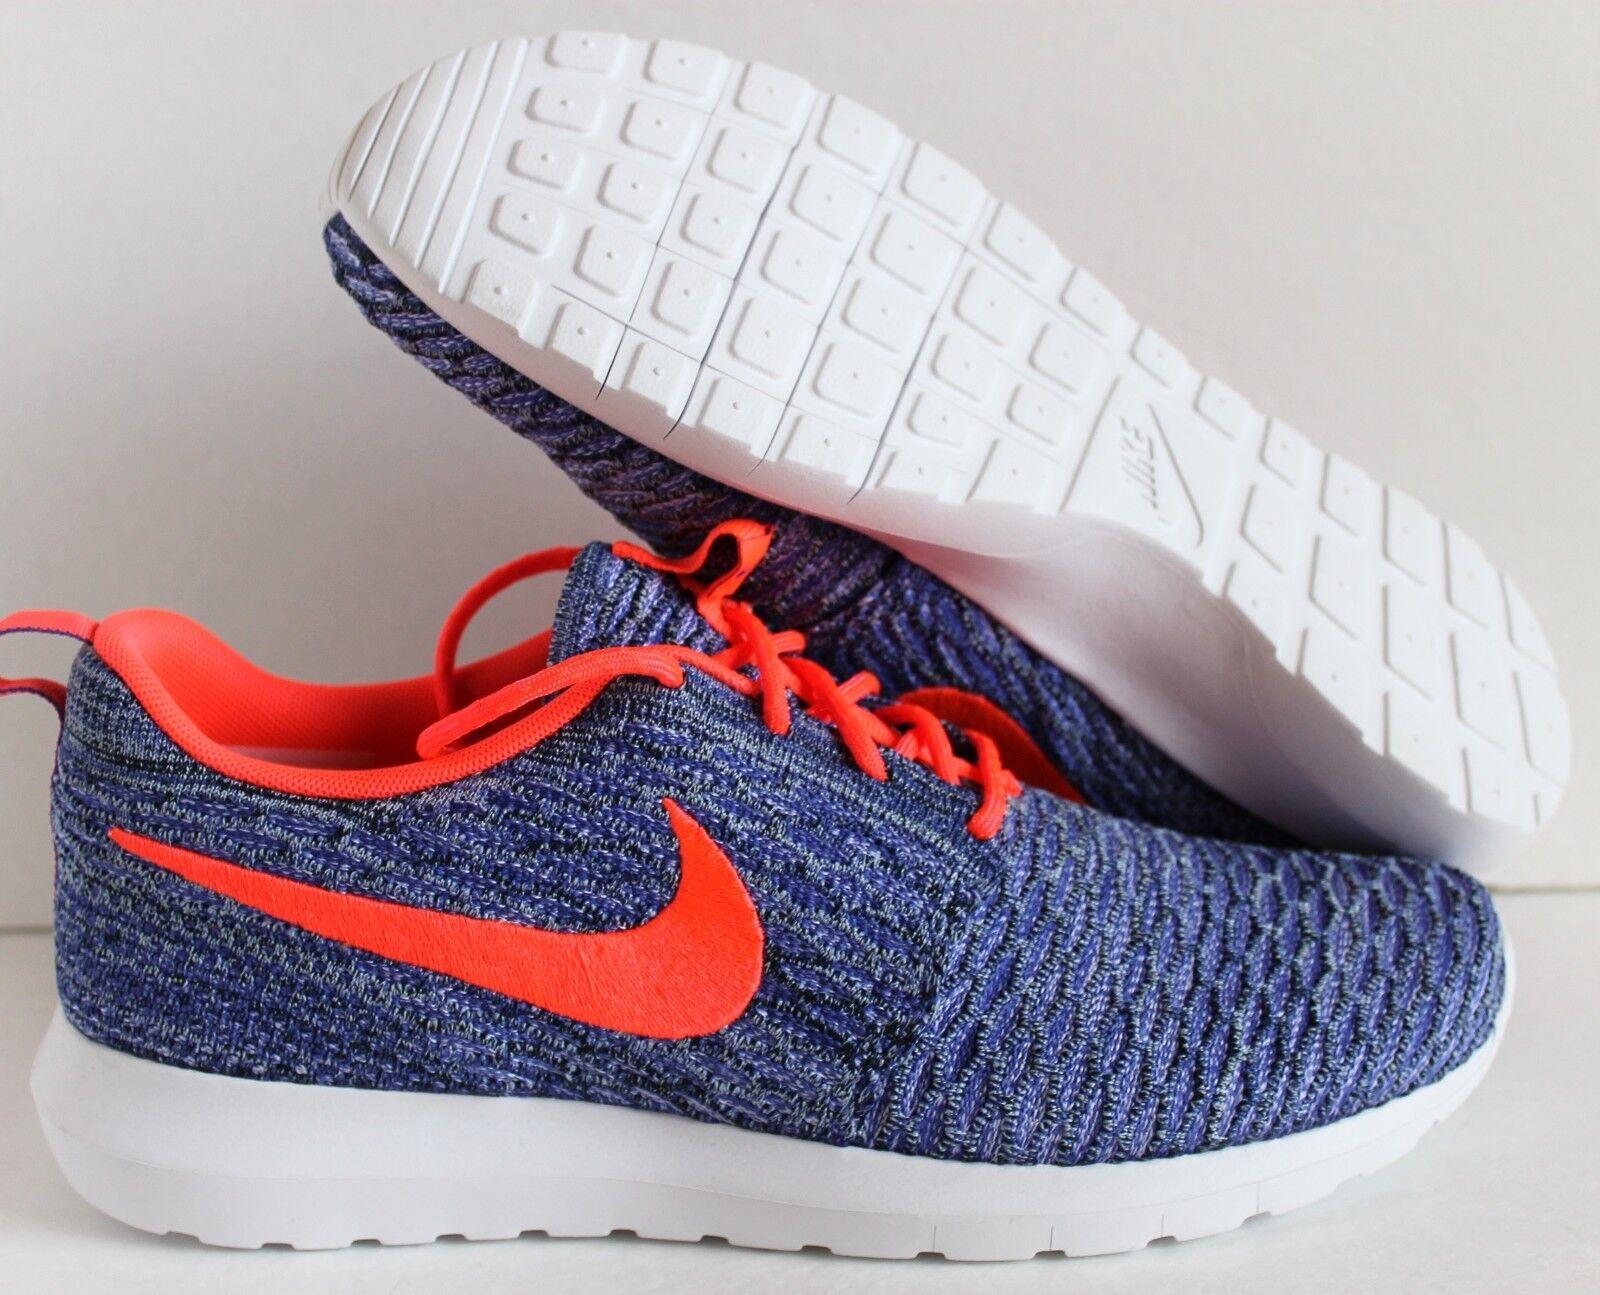 Nike lava flyknit rosherun persiano violet-hot lava Nike sz - 677243-500] aeae36